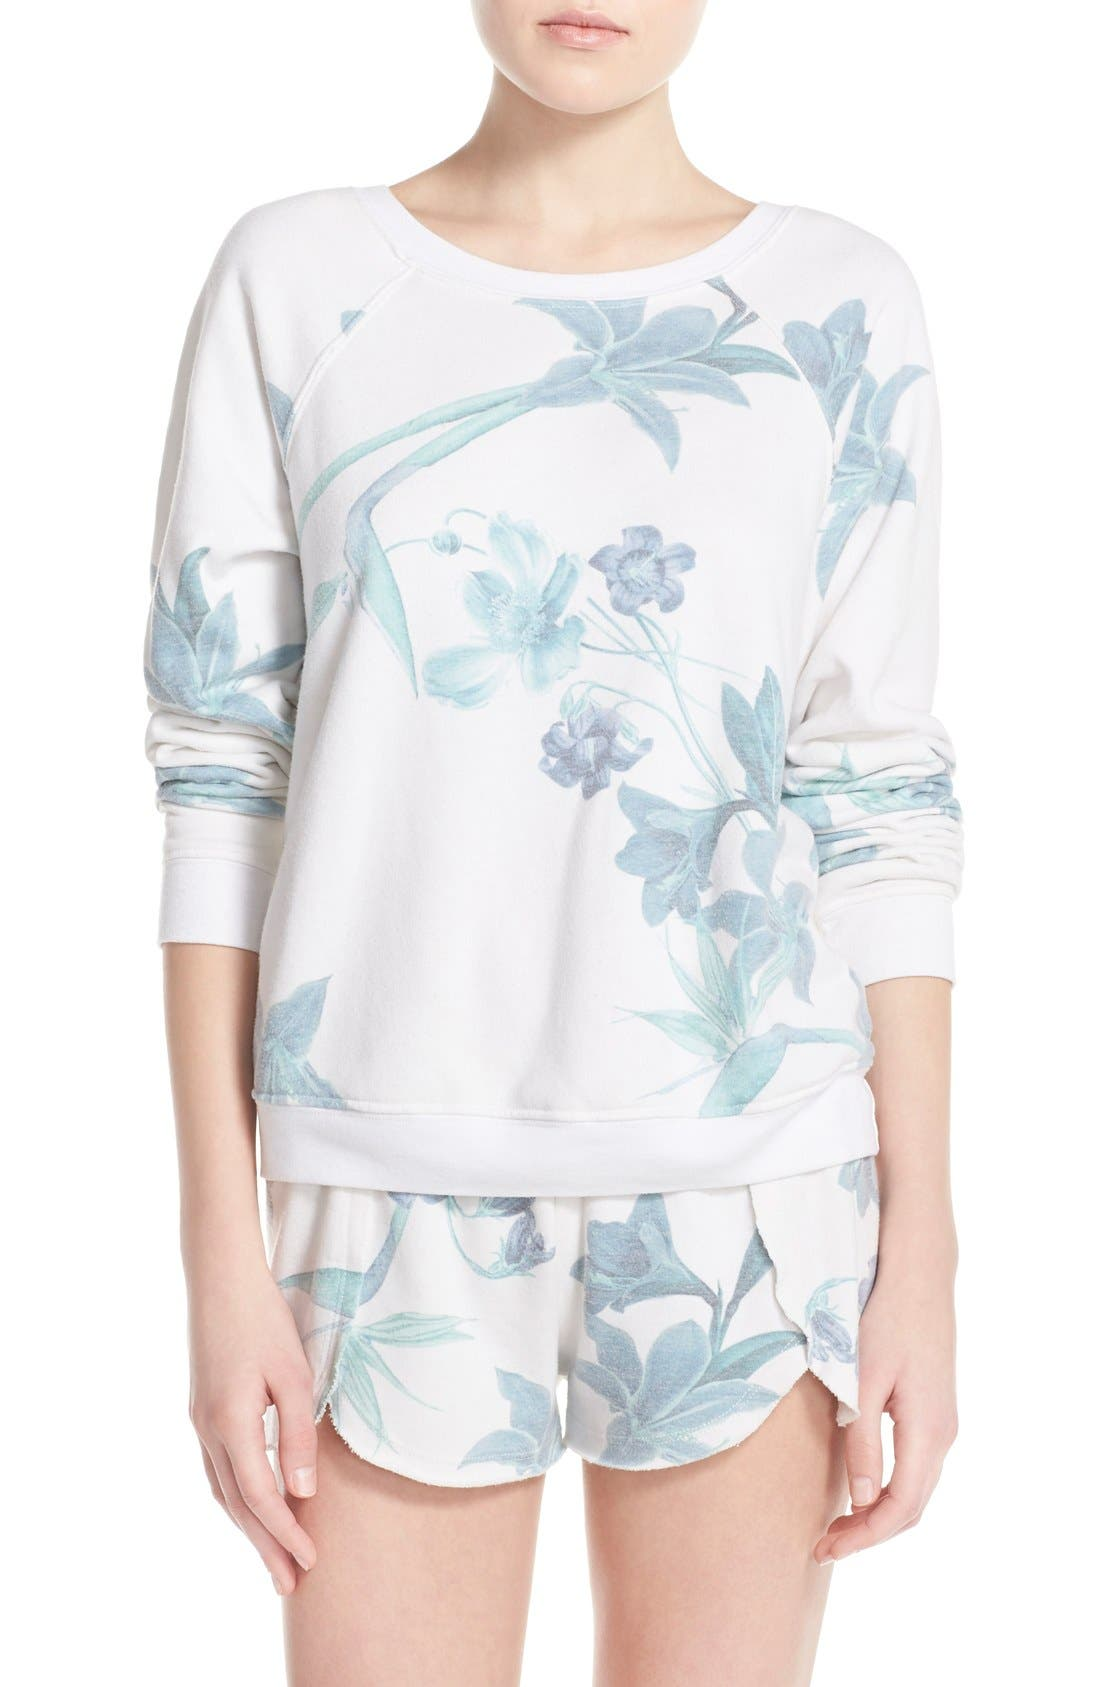 Alternate Image 1 Selected - 35mm 'Jenna' Floral Sweatshirt